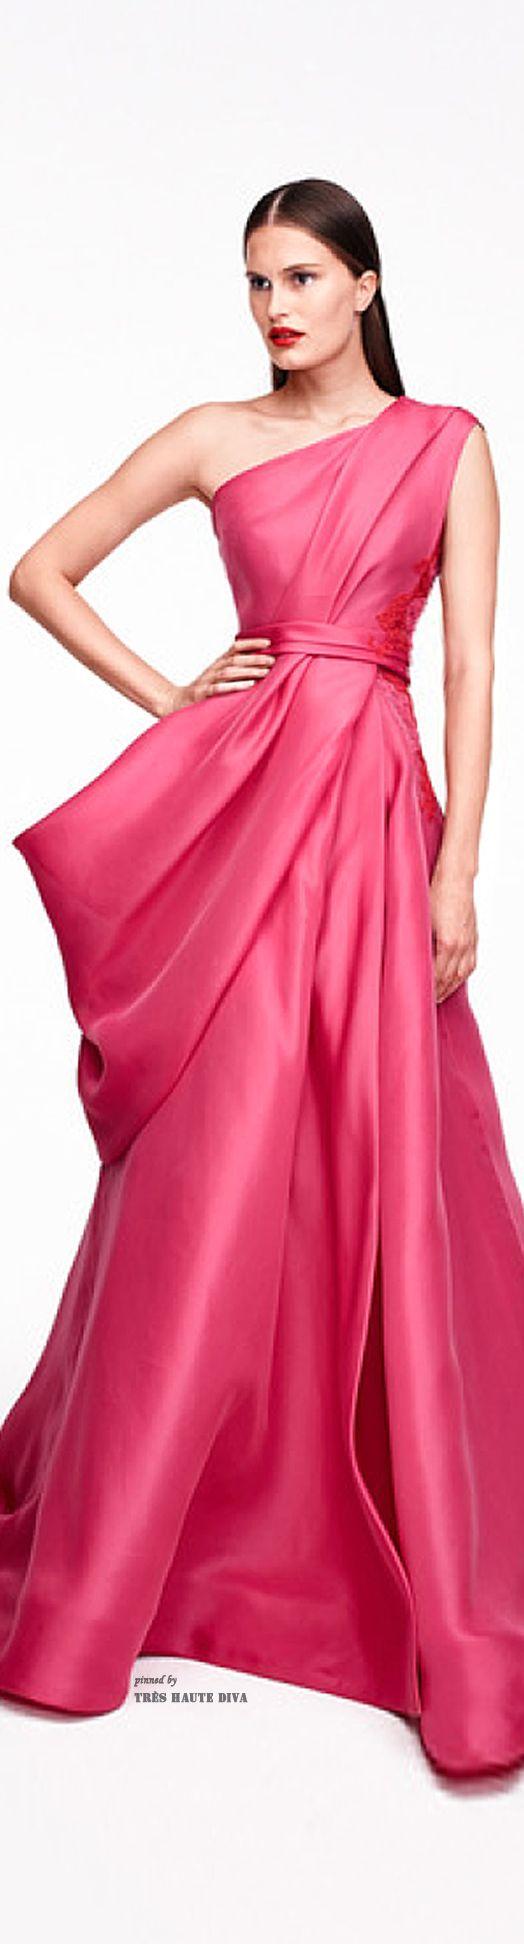 156 best MONIQUE LHUILLIER - Diseñadora de moda filipina radicada en ...